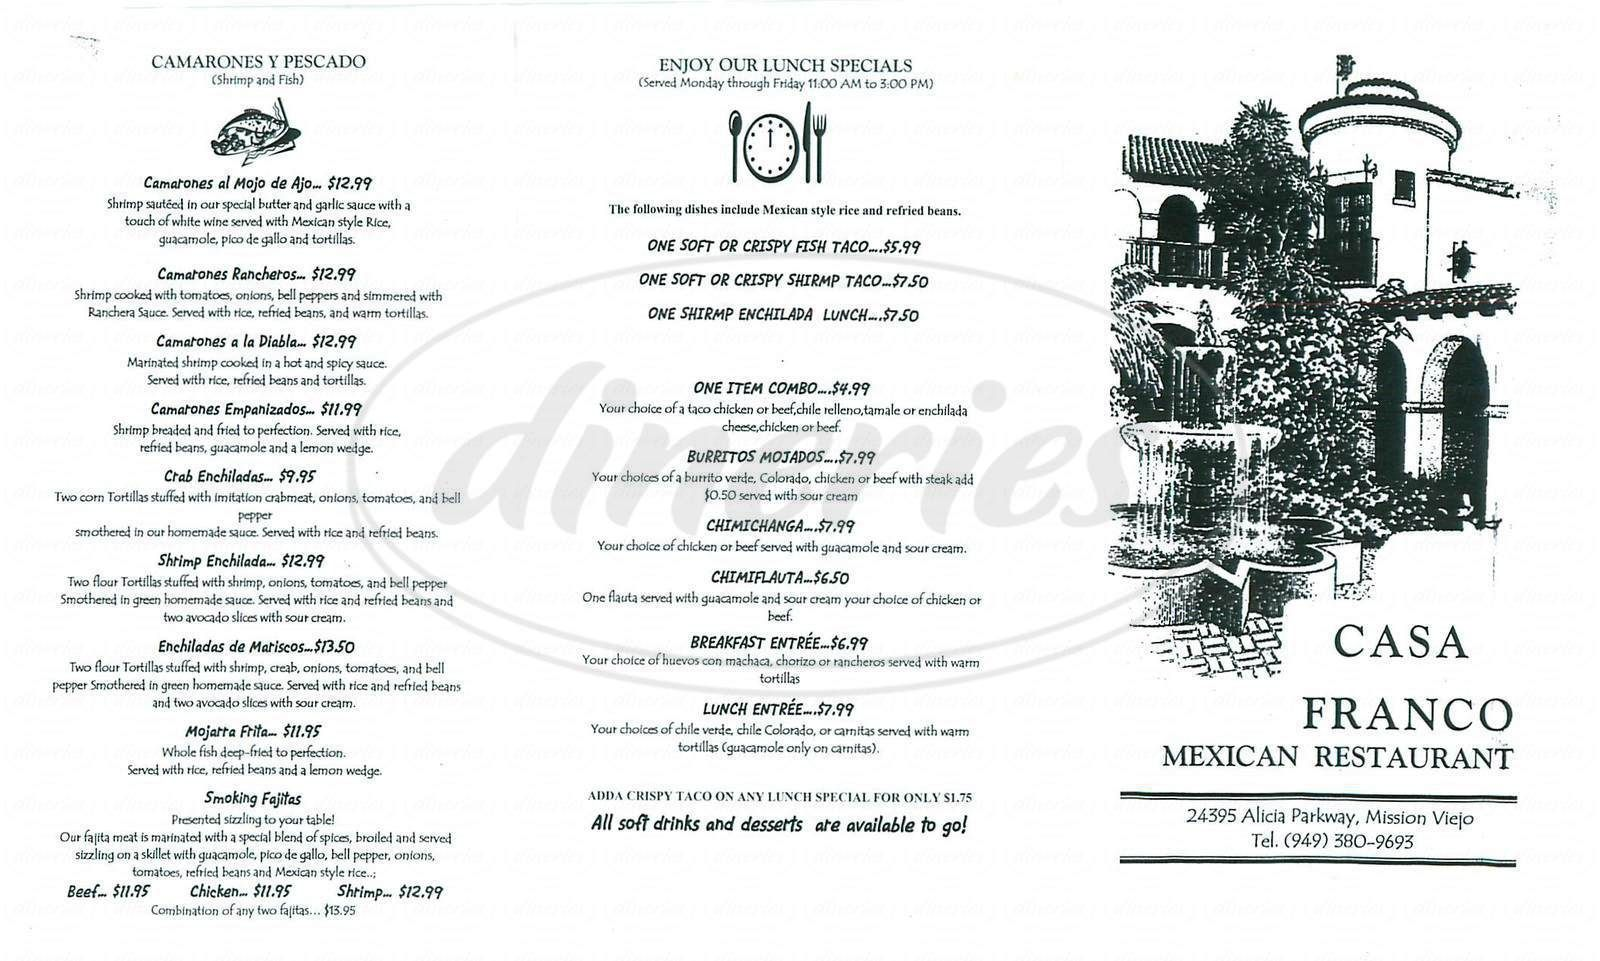 menu for Casa Franco Menu, Mission viejo, Franco